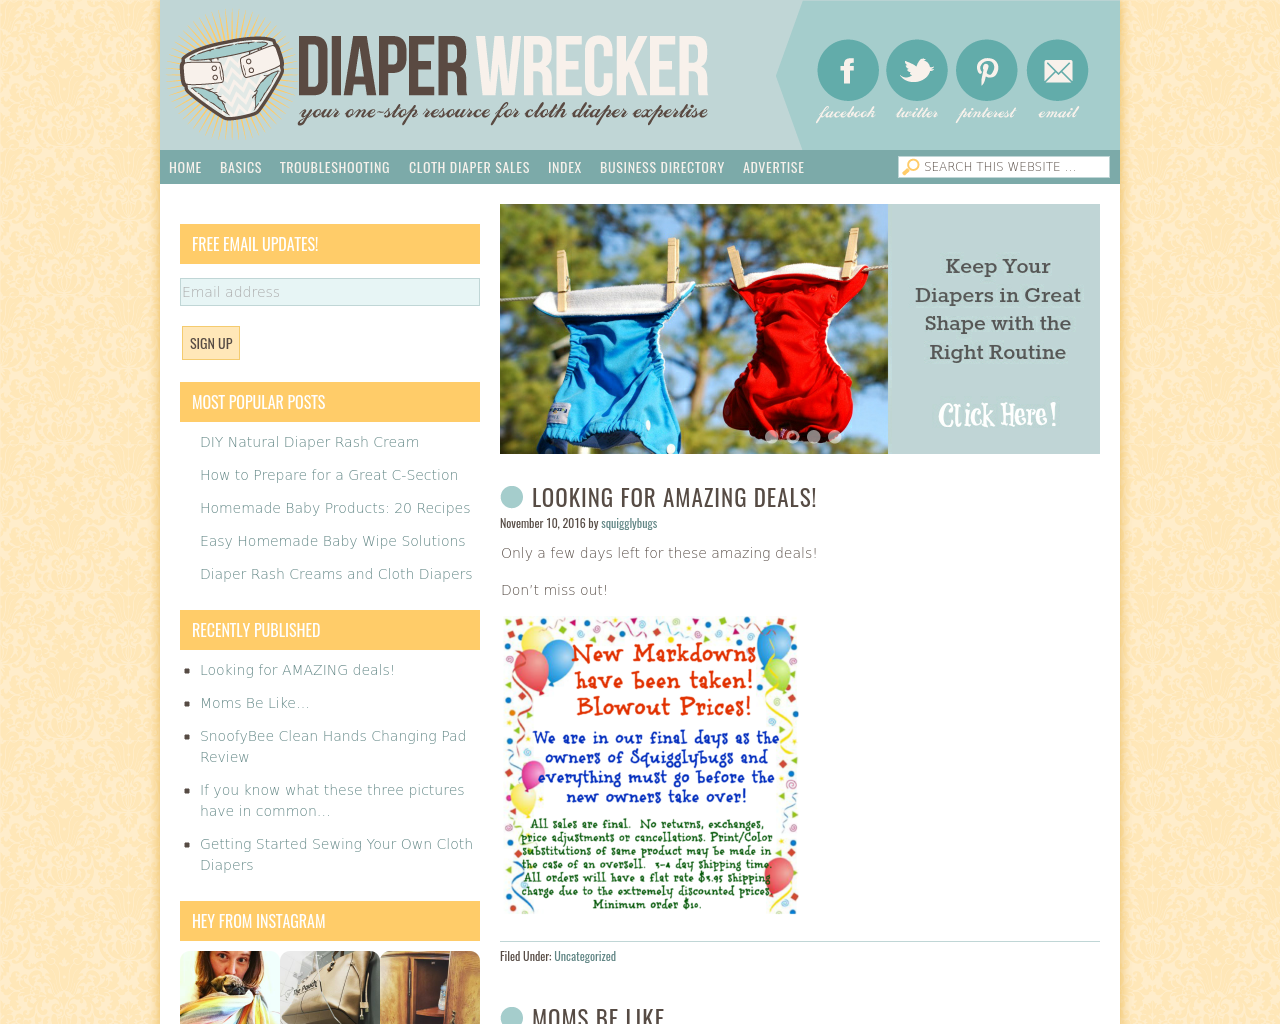 DIAPER-WRECKER-Advertising-Reviews-Pricing